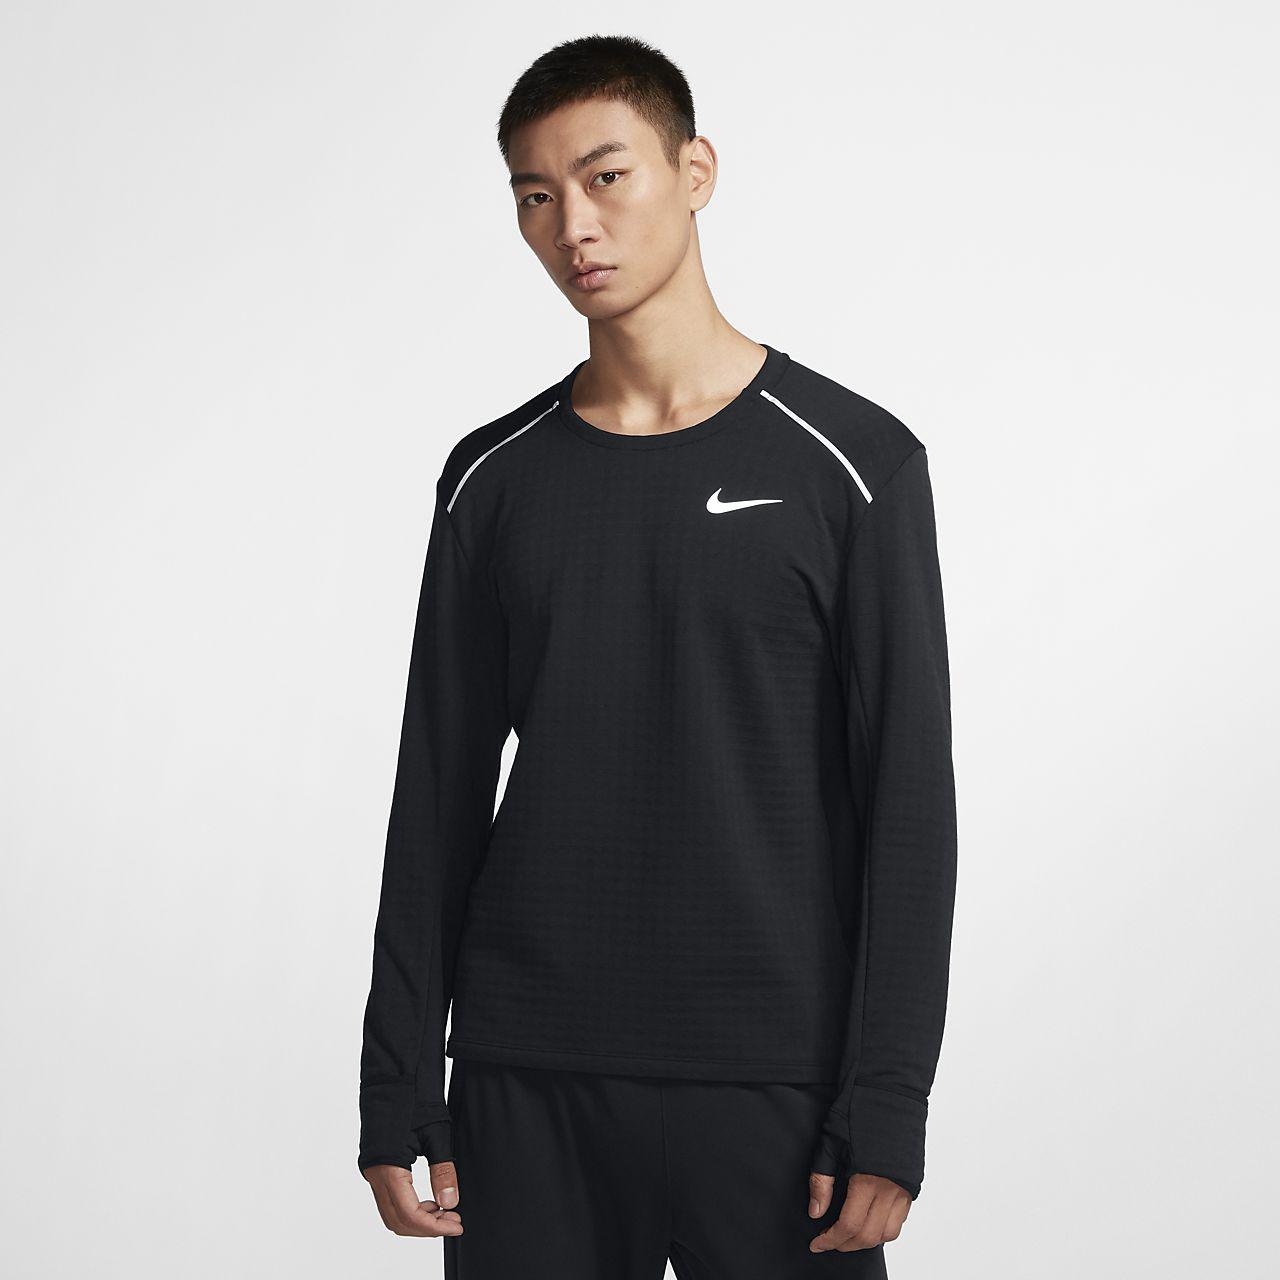 Nike Therma Sphere Element 3.0 男子长袖跑步上衣